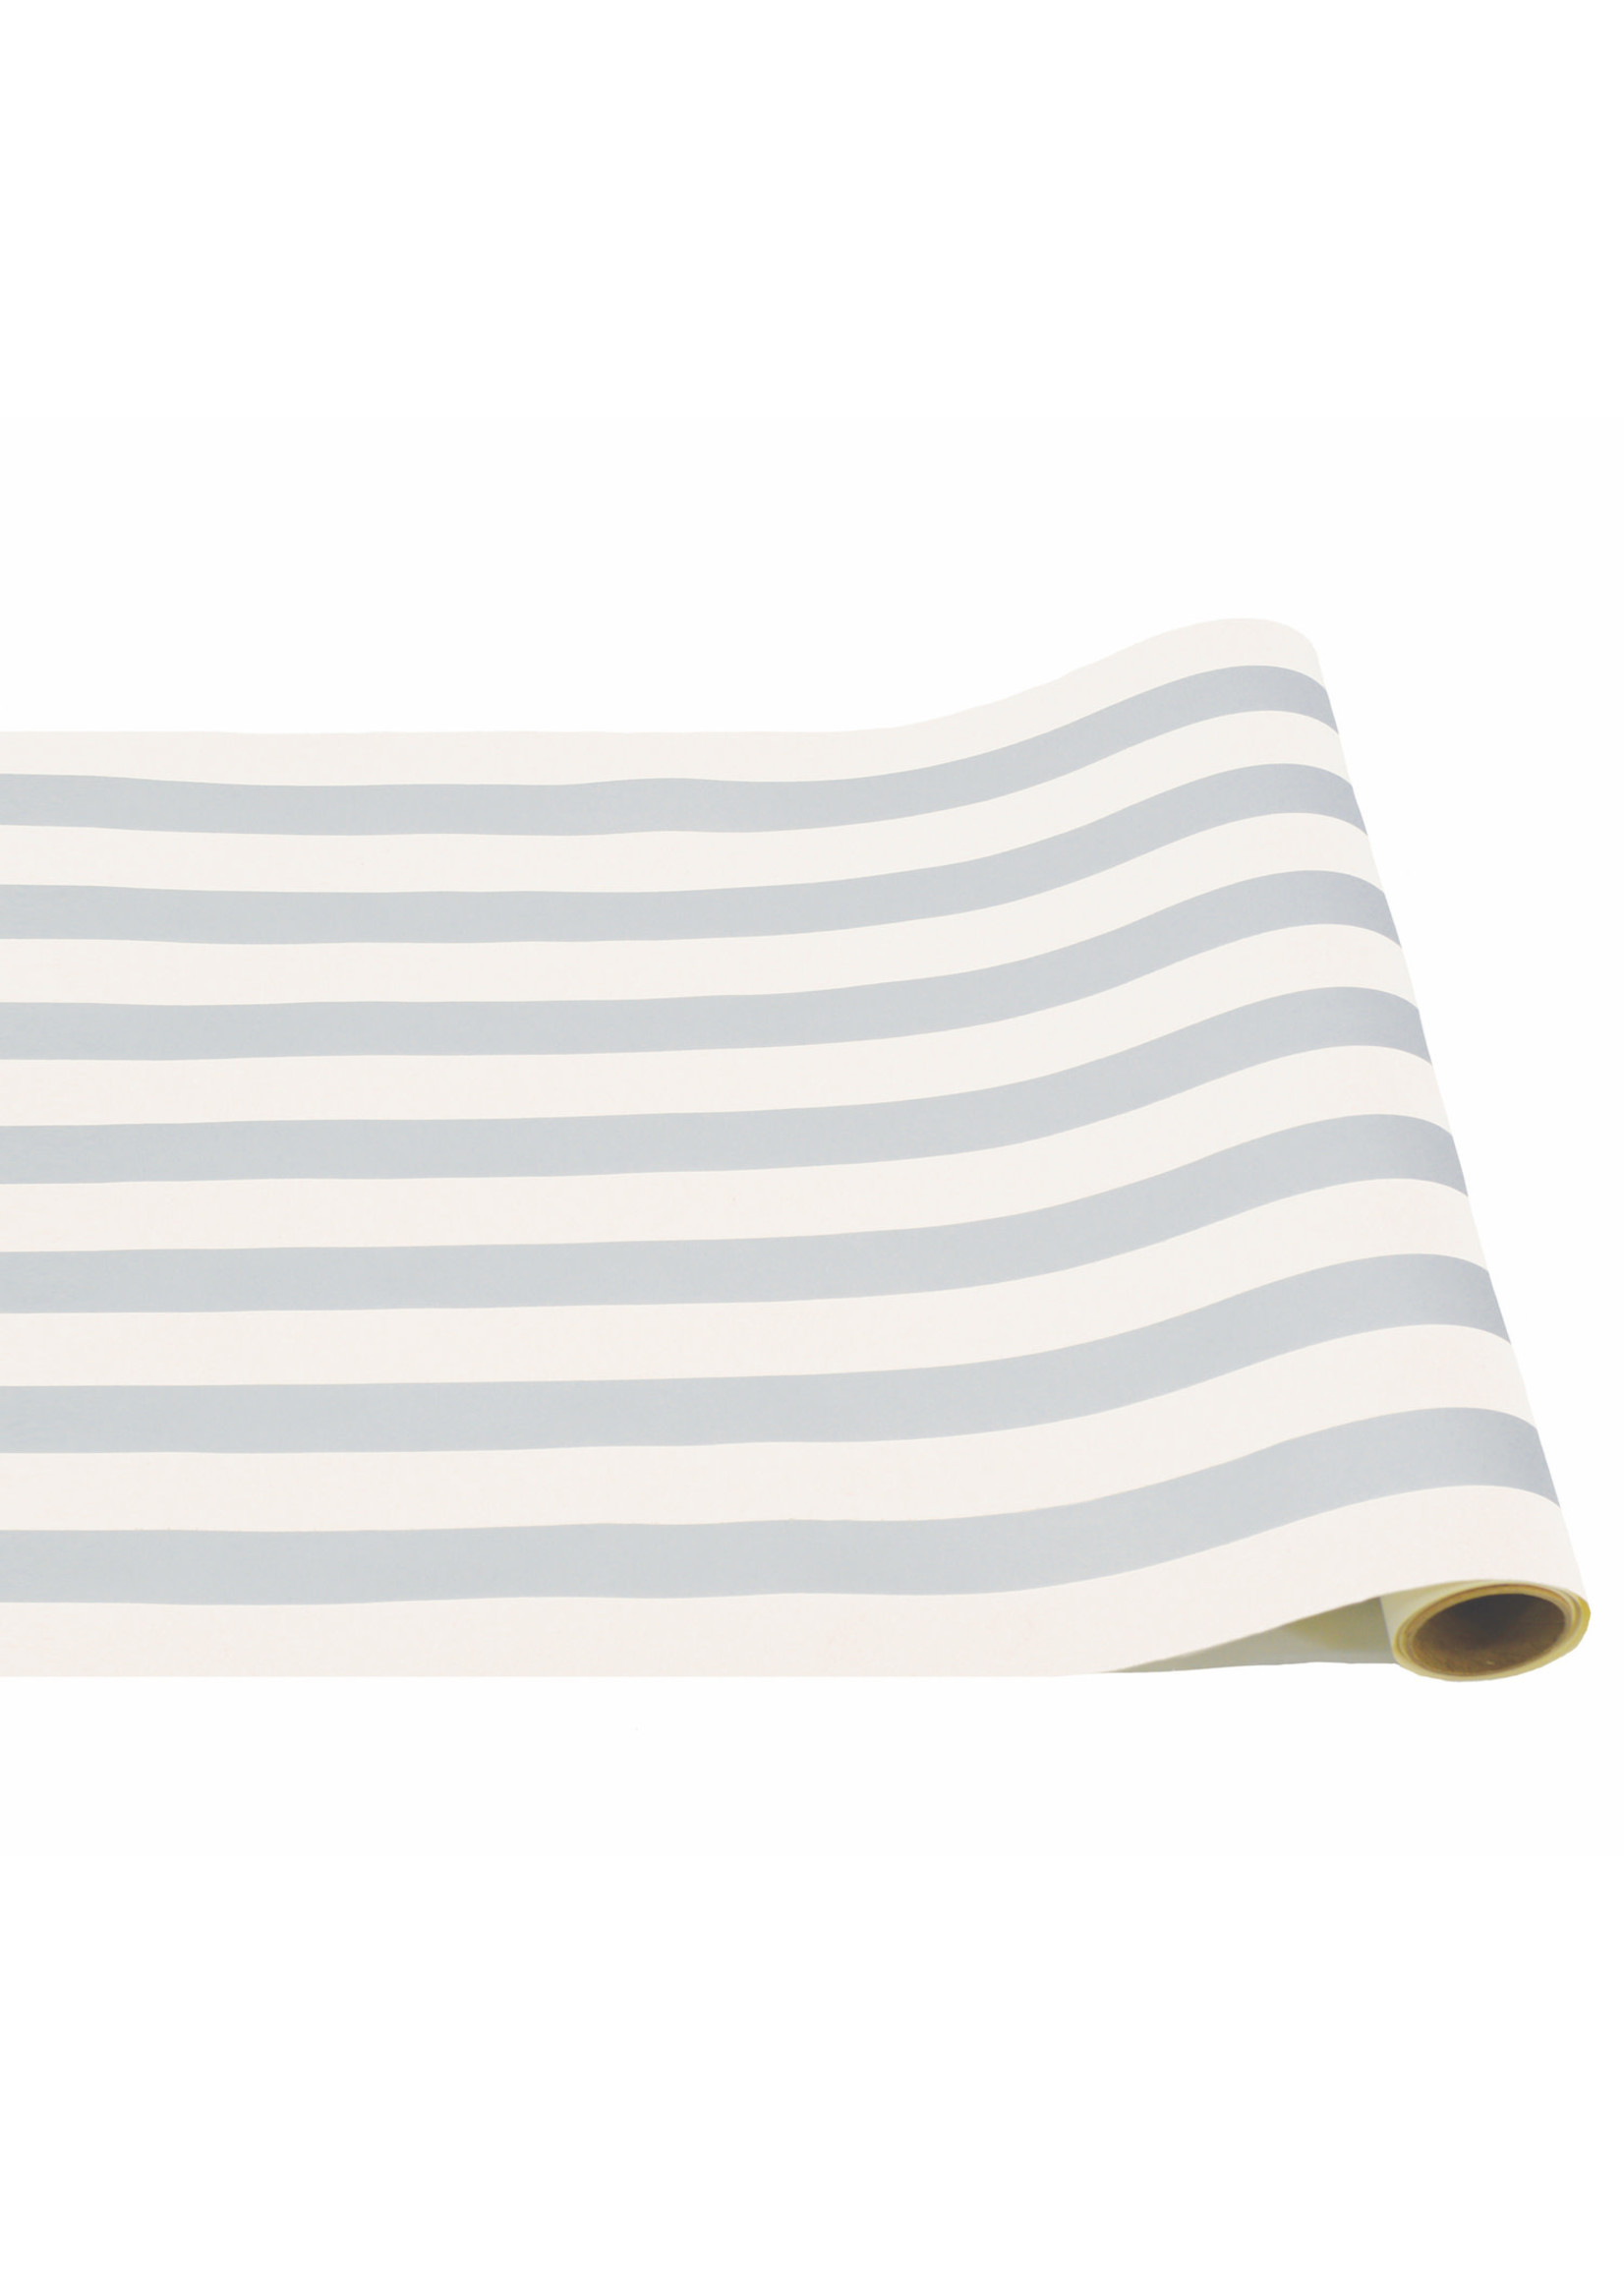 Hester & Cook Paper Runner - Classic Stripe Silver